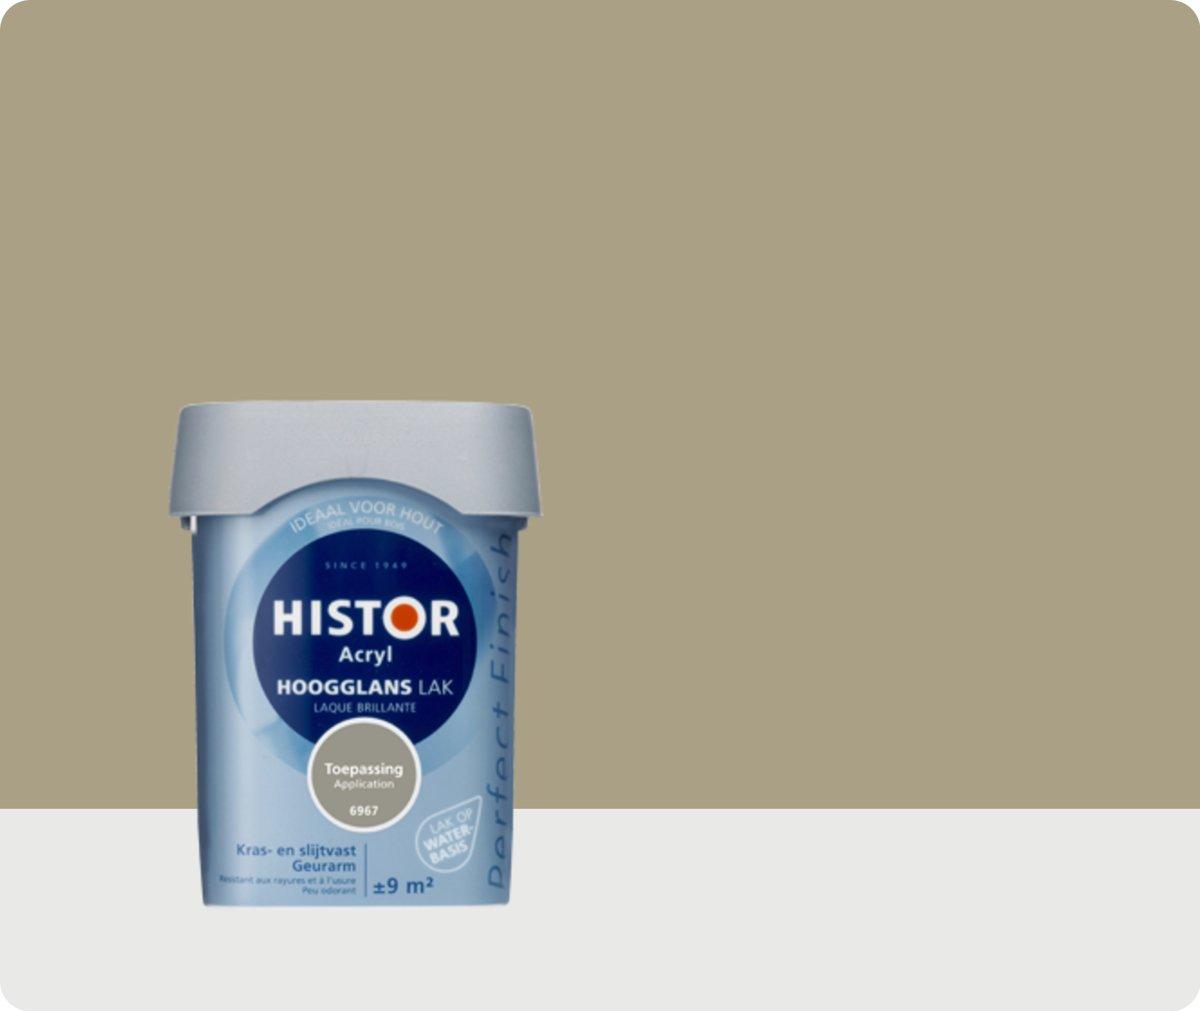 Histor Perfect Finish Lak Acryl Hoogglans 0,75 liter - Toepassing